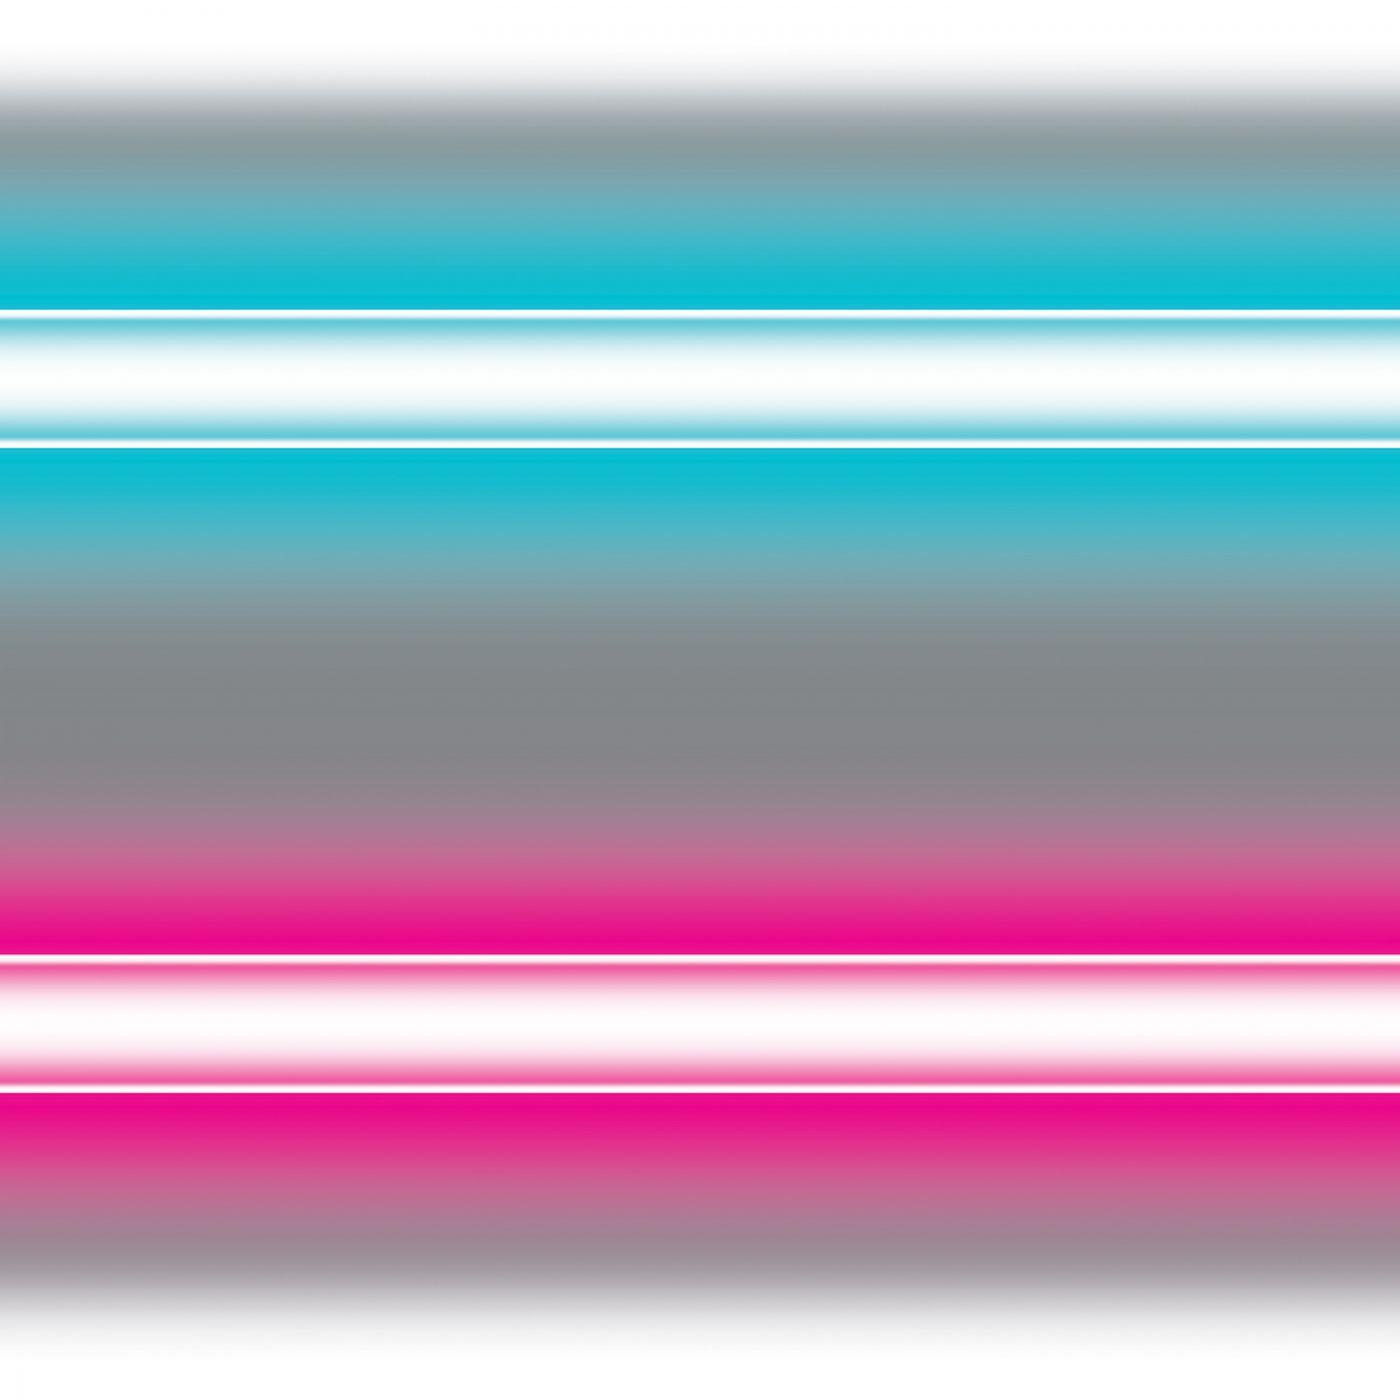 Neon Border (6) image